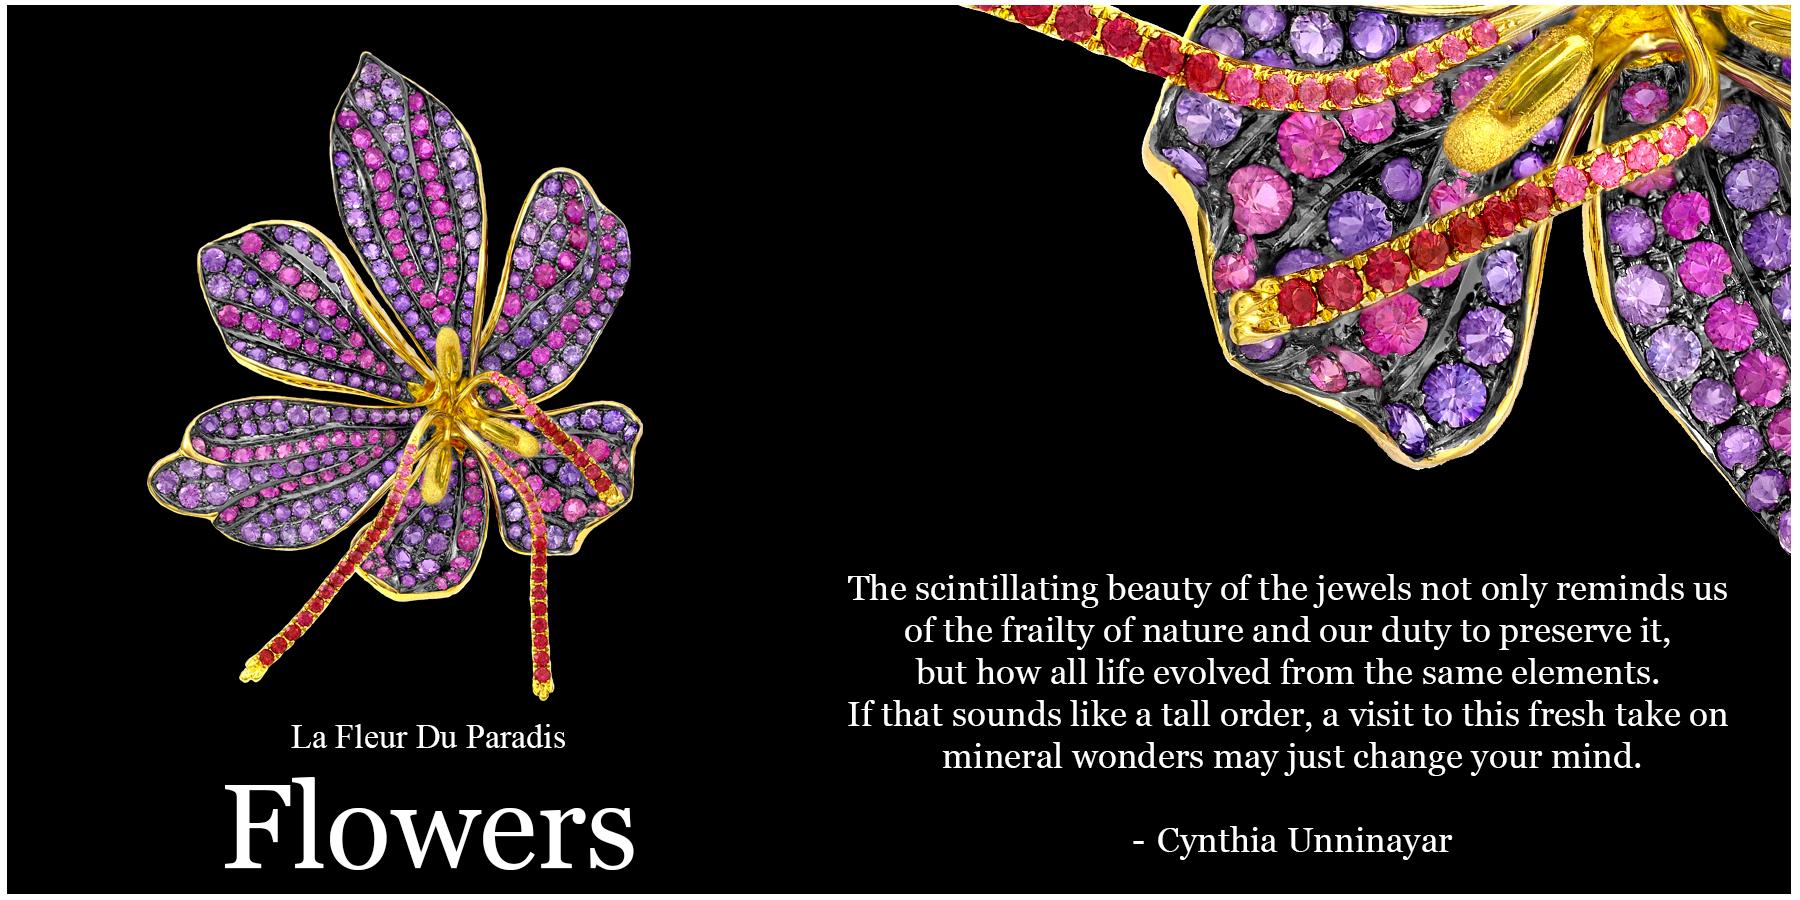 Crevoshay Flowers